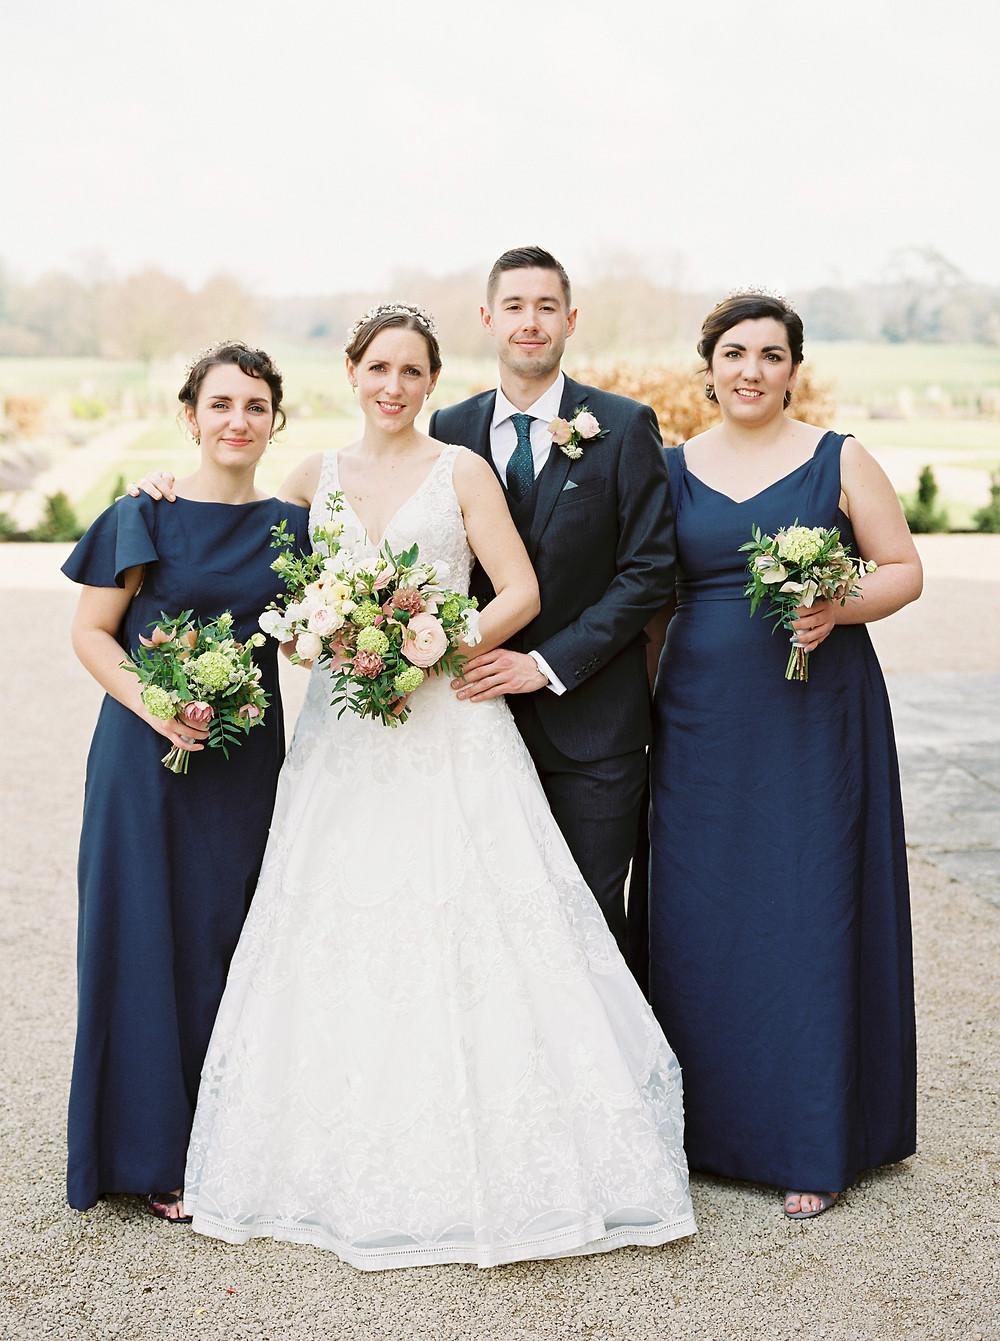 Dorset Wedding - Real Couple